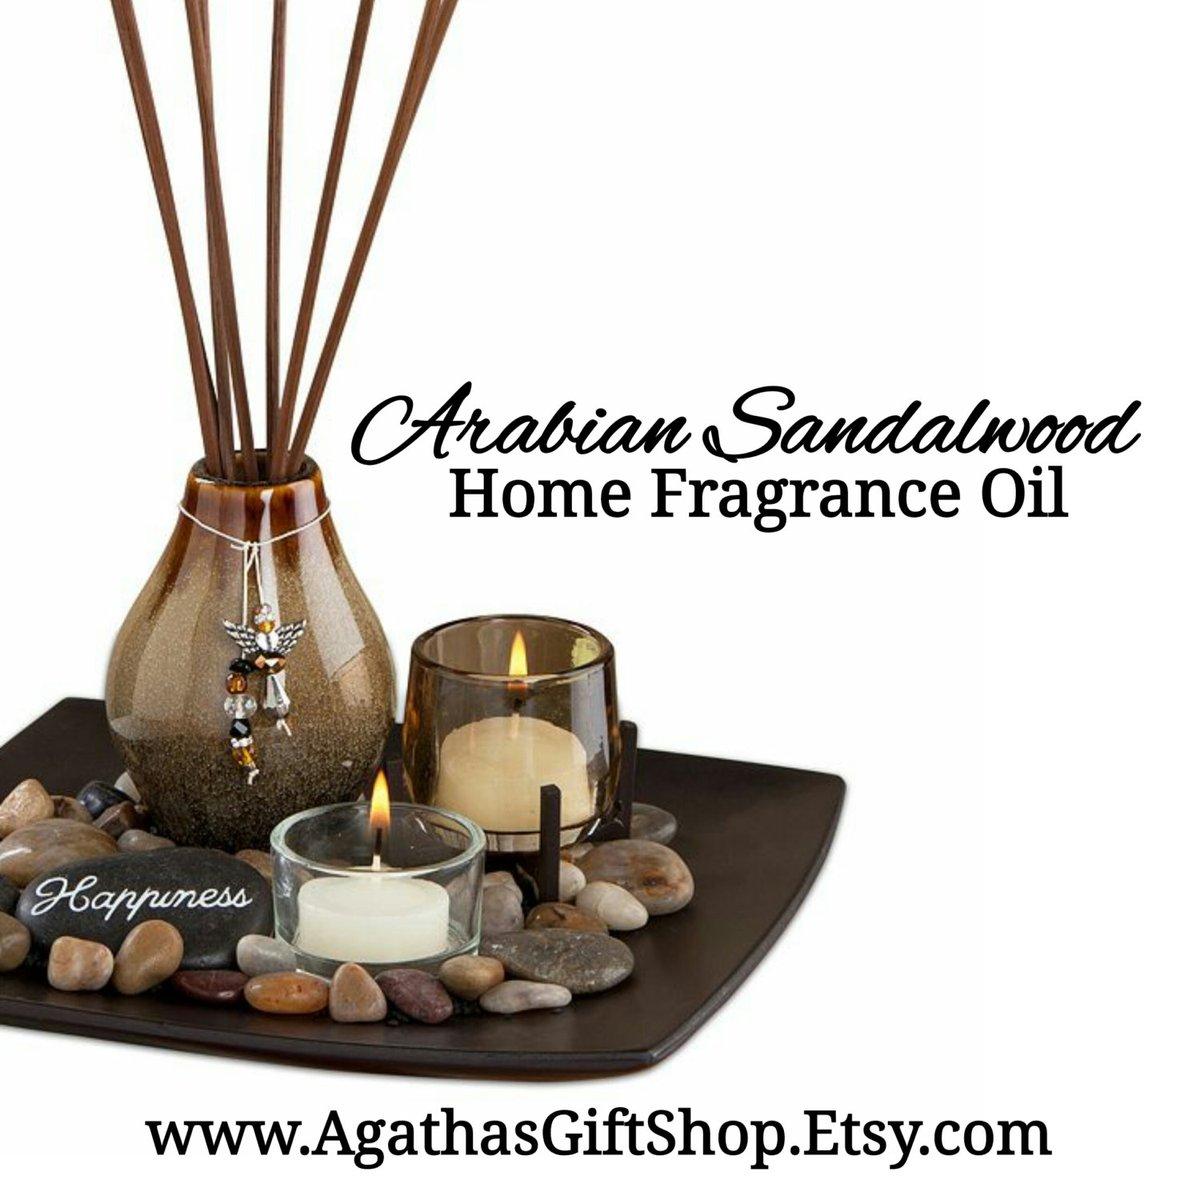 Arabian Sandalwood Home Fragrance Diffuser Warmer Aromatherapy Burning Oil  #Etsy #Incense #HomeFragranceOil #GiftShopSale #PerfumeBodyOils #CyberMonday #BlackFriday #HerbalRemedies #Wedding #AromatherapyOil #Aromatheraphy